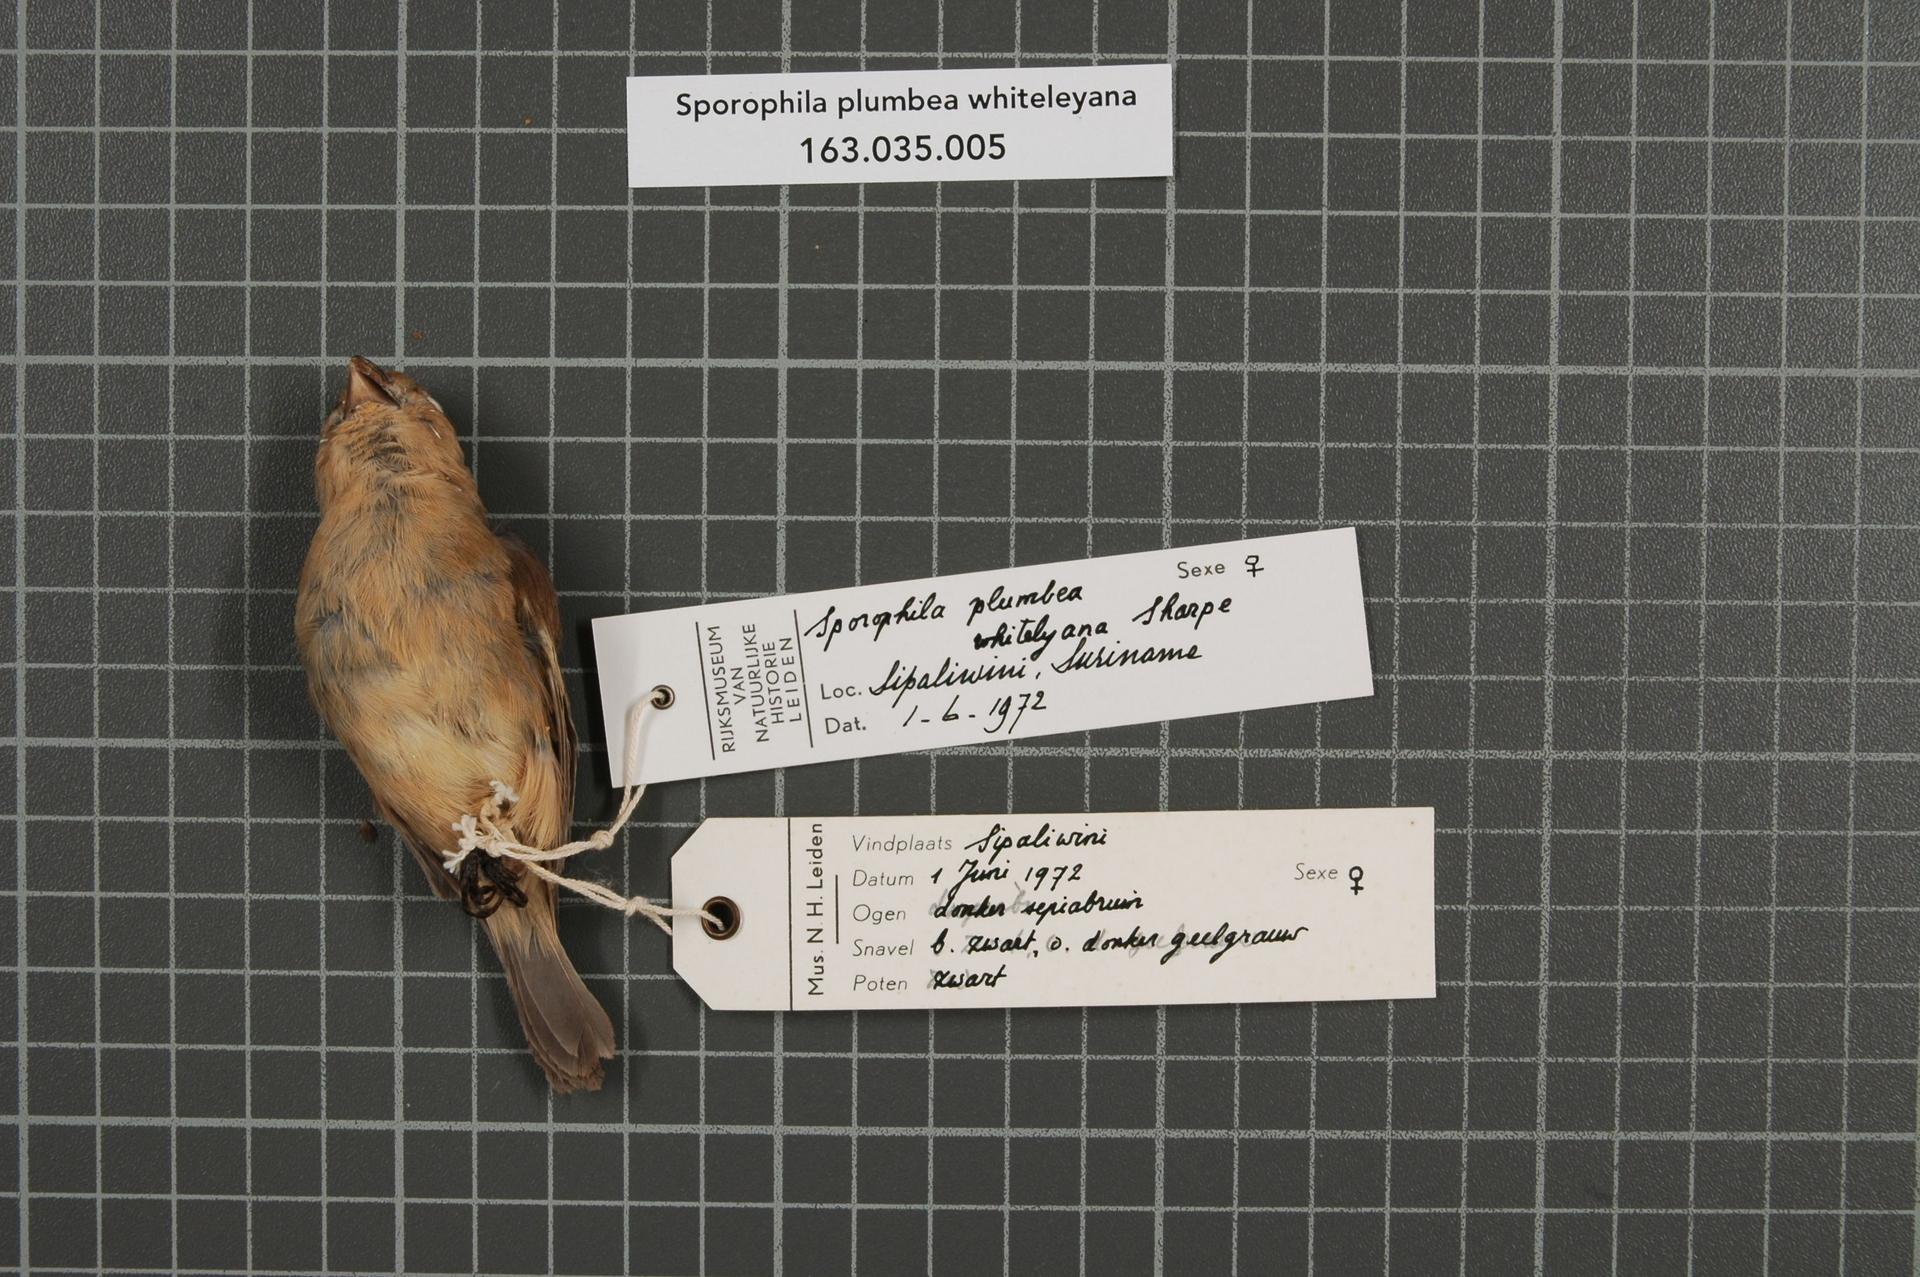 RMNH.AVES.72754   Sporophila plumbea whiteleyana (Sharpe, 1888)